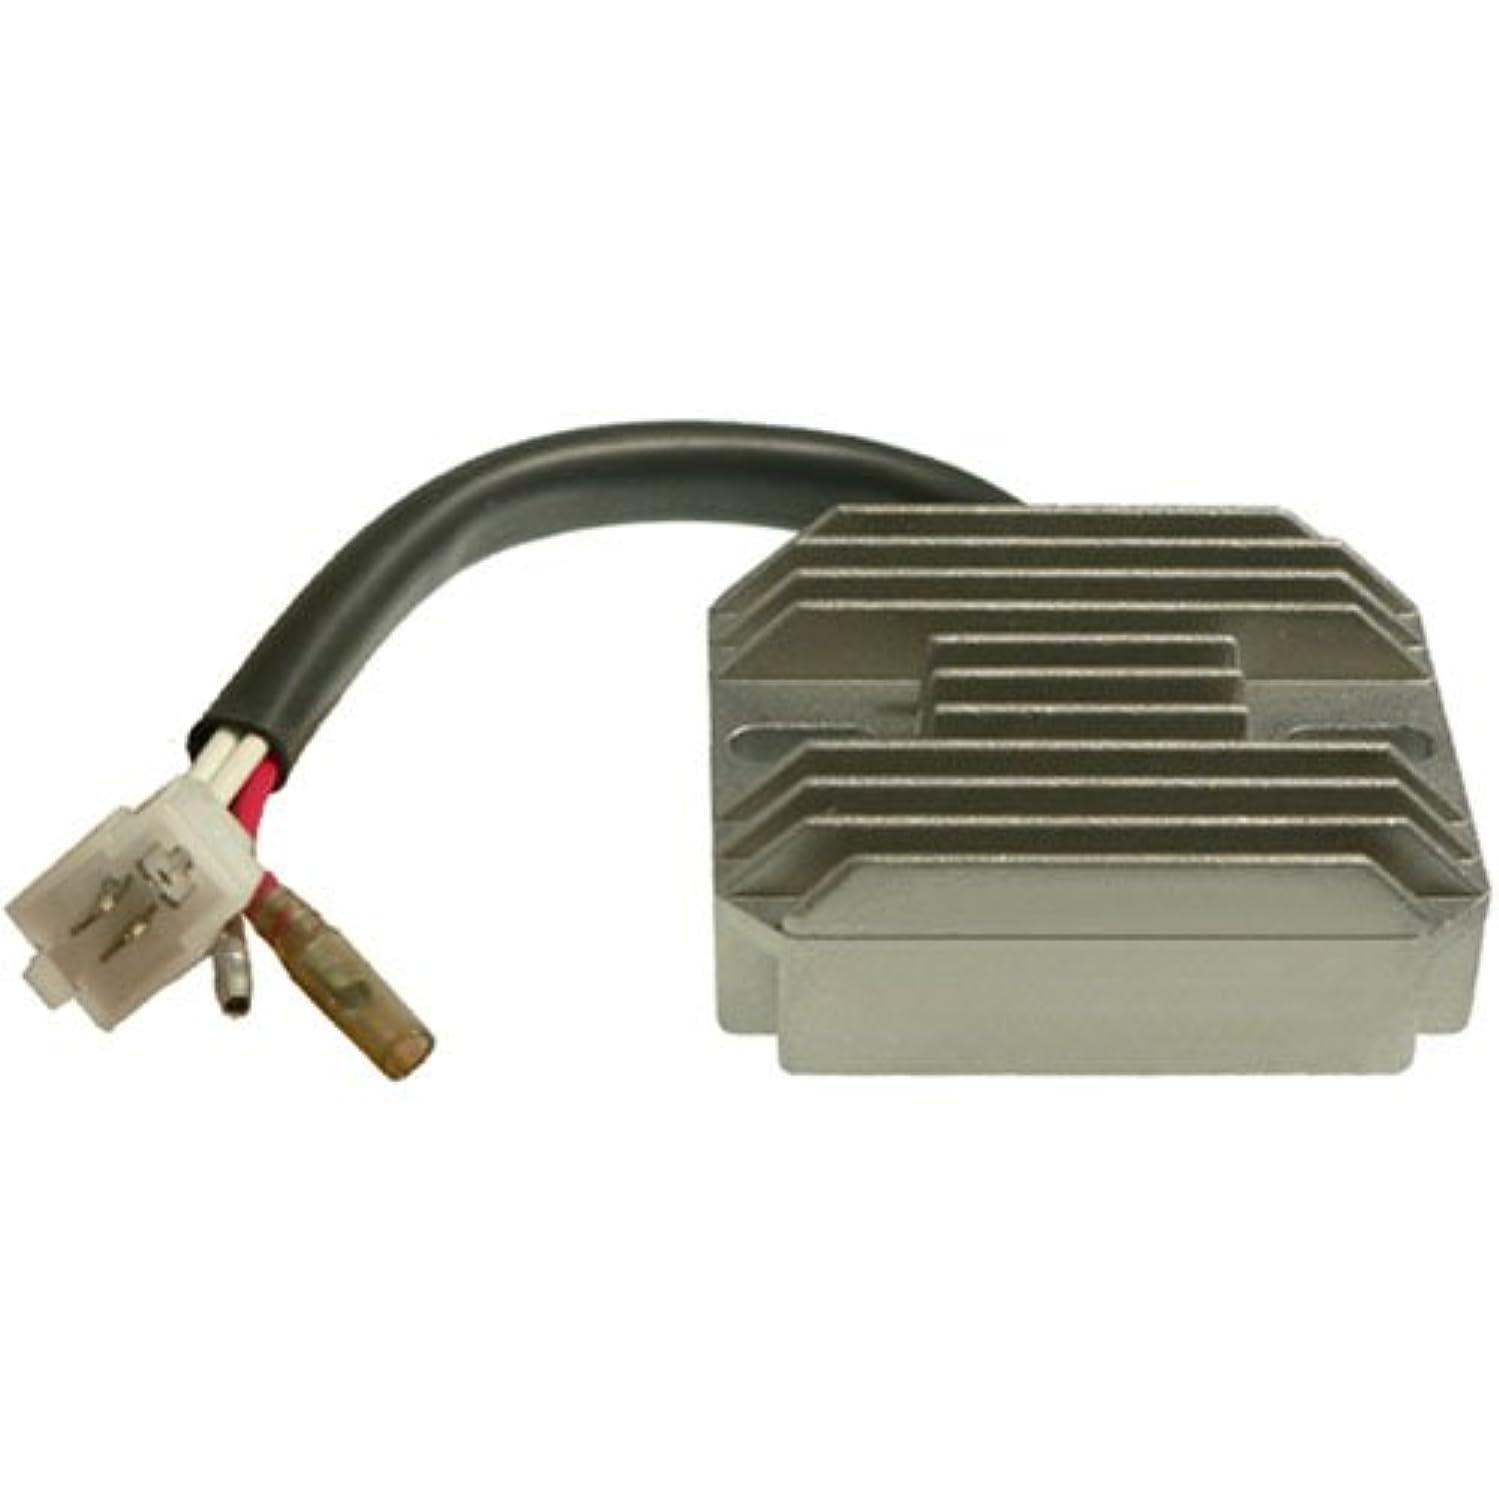 DB Electrical AYA6013 New Voltage Regulator For Yamaha Atv Yfm 350Cc Warrior 97 98 99 00 01 02 03 04 1997 1998 1999 2000 2001 2002 2003 2004 ESP2343 SH640-1 495873 3HT-81960-00-00 4KB-81960-10-00